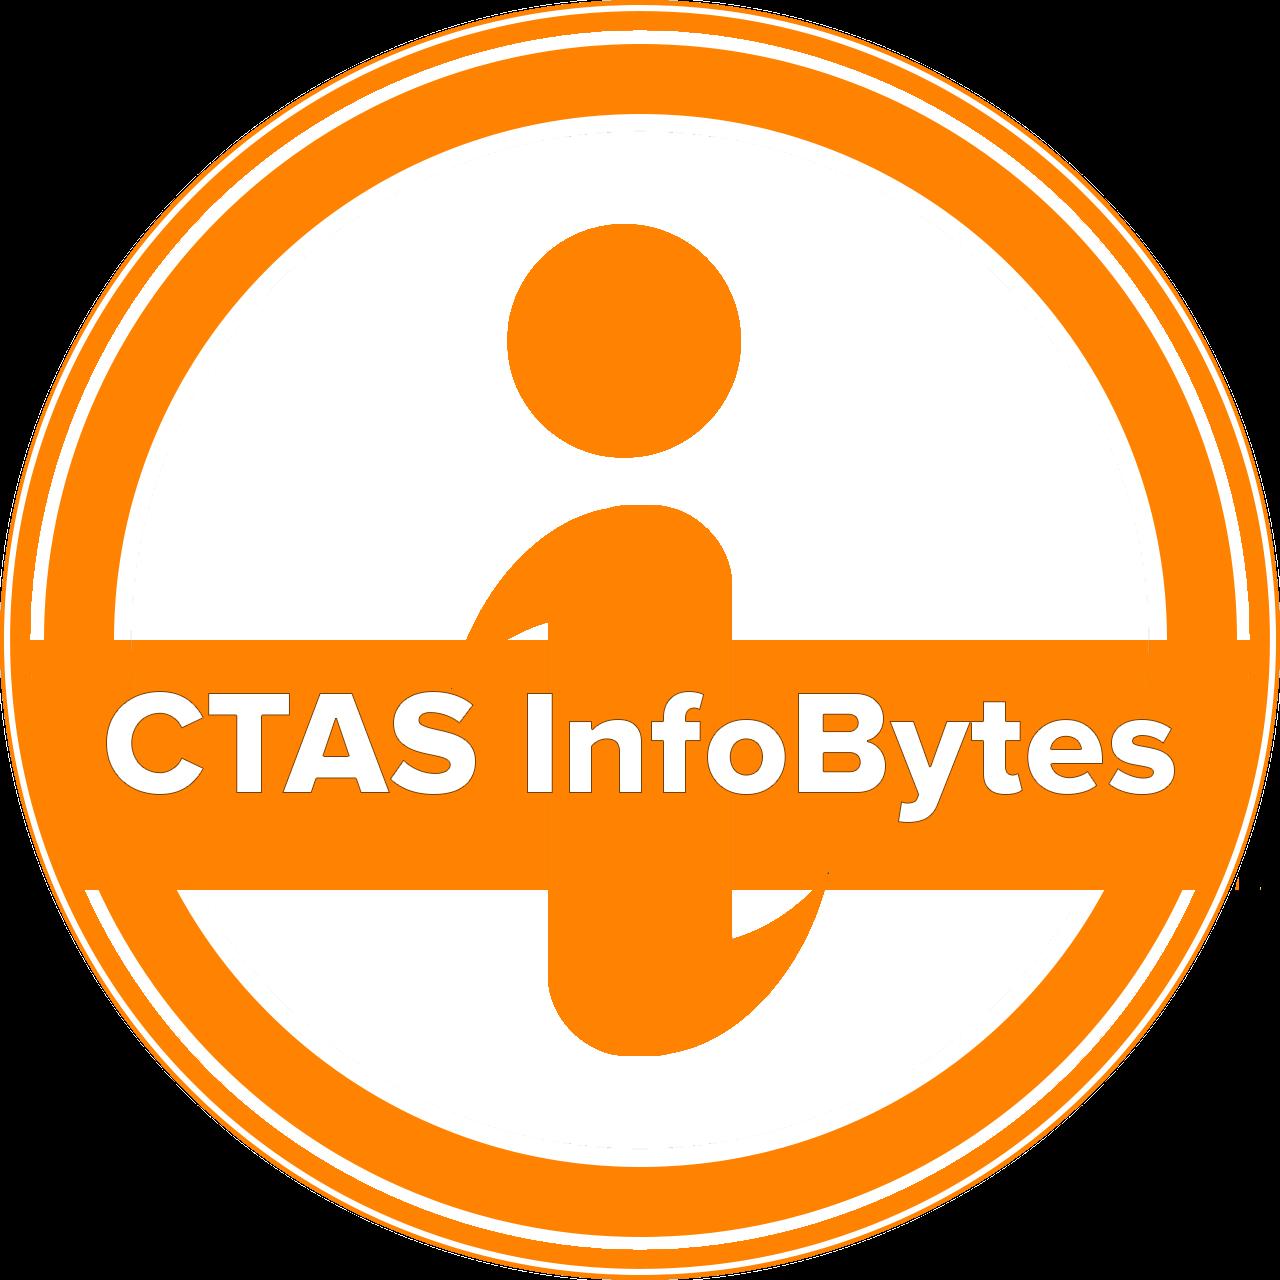 infobytes5.png